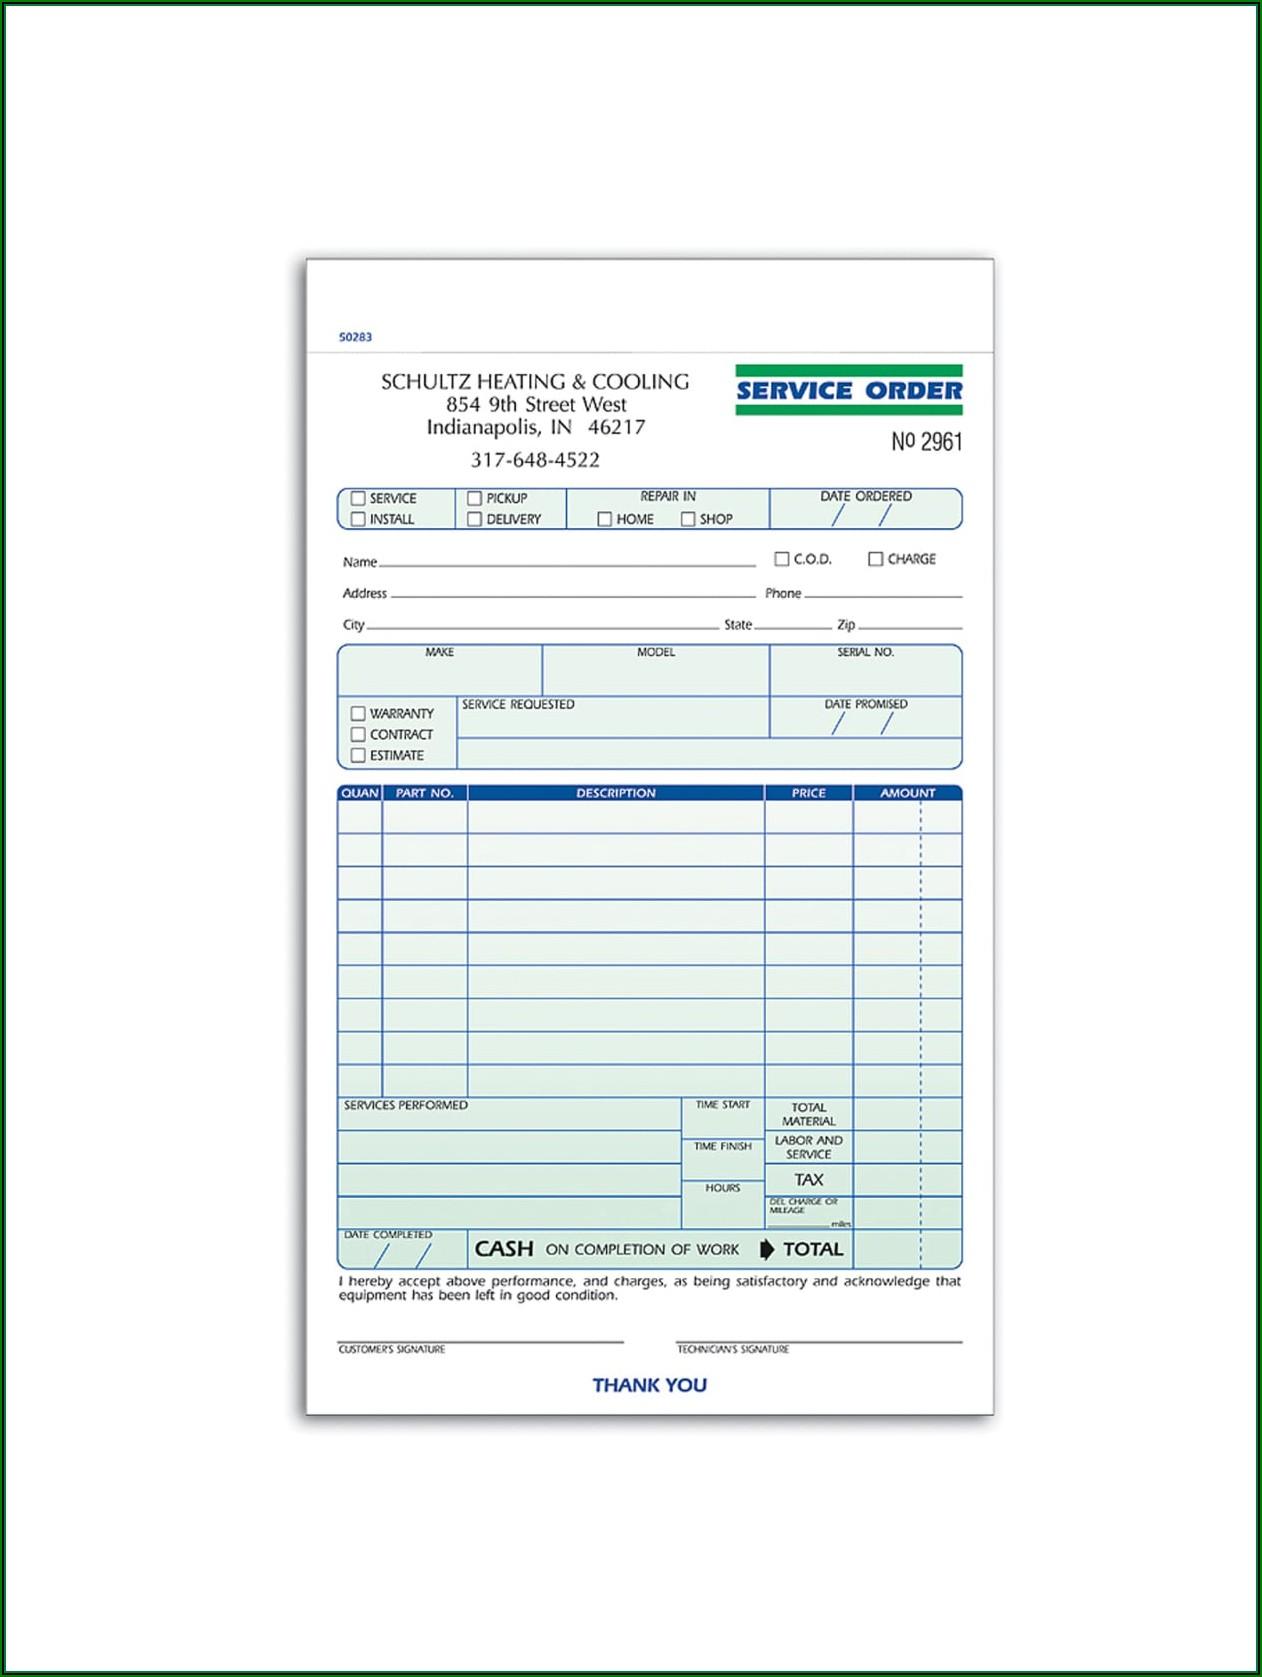 Carbonless Service Order Forms